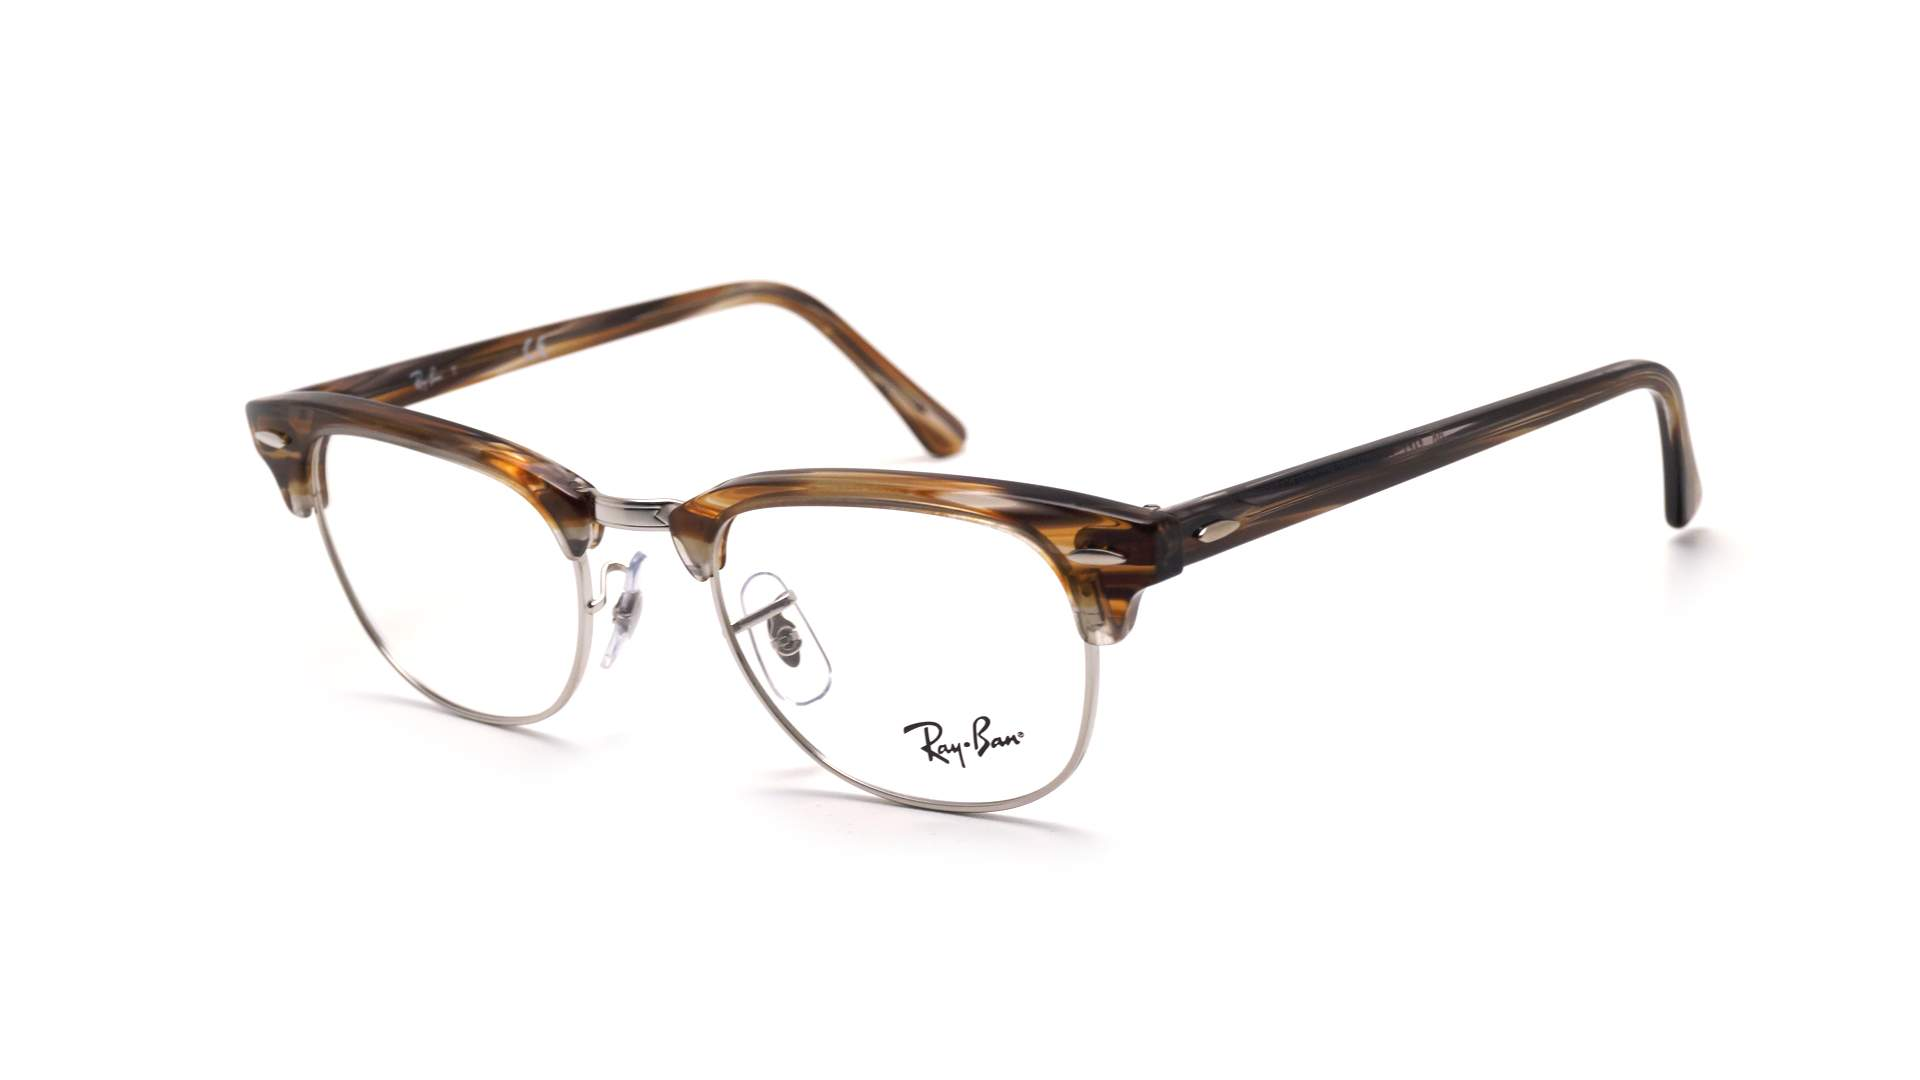 Eyeglasses Ray-Ban Clubmaster Brown RX5154 RB5154 5749 49-21 Small 29b4b2d451